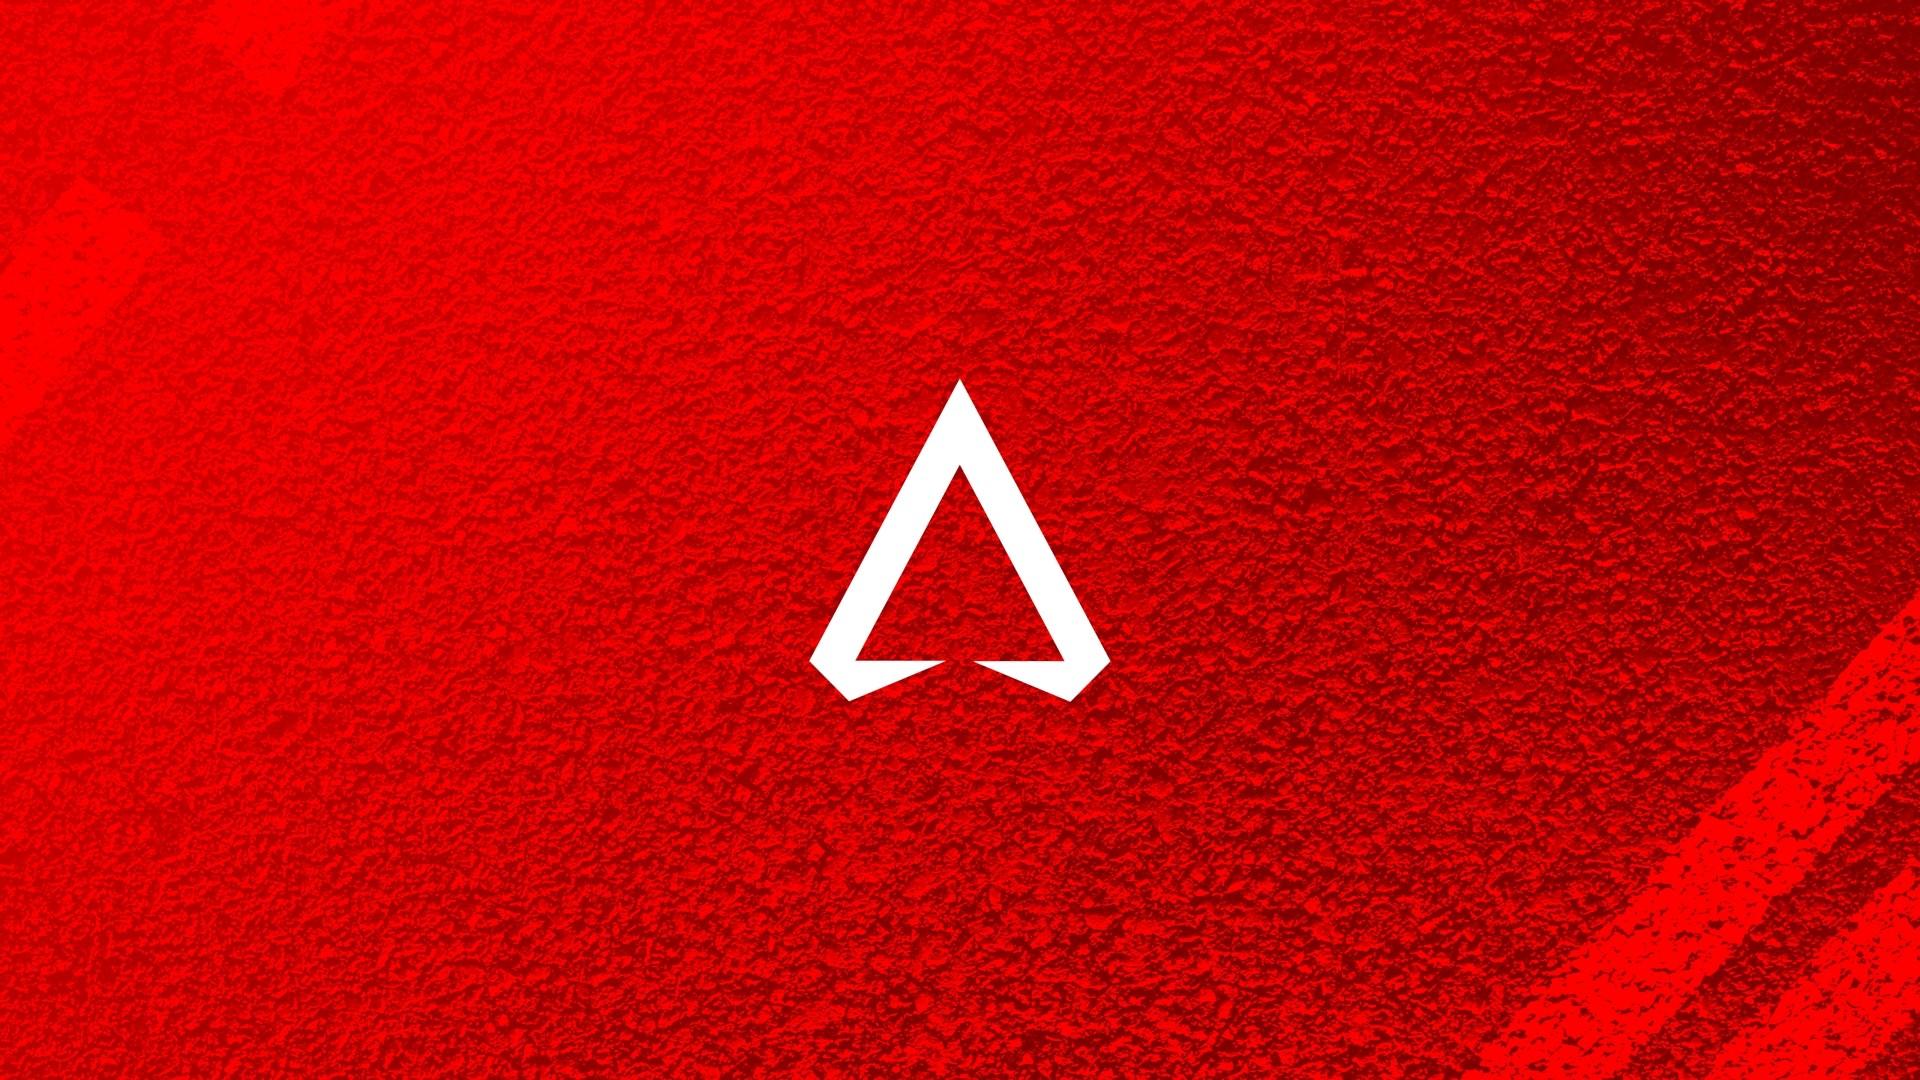 Apex Download Wallpaper